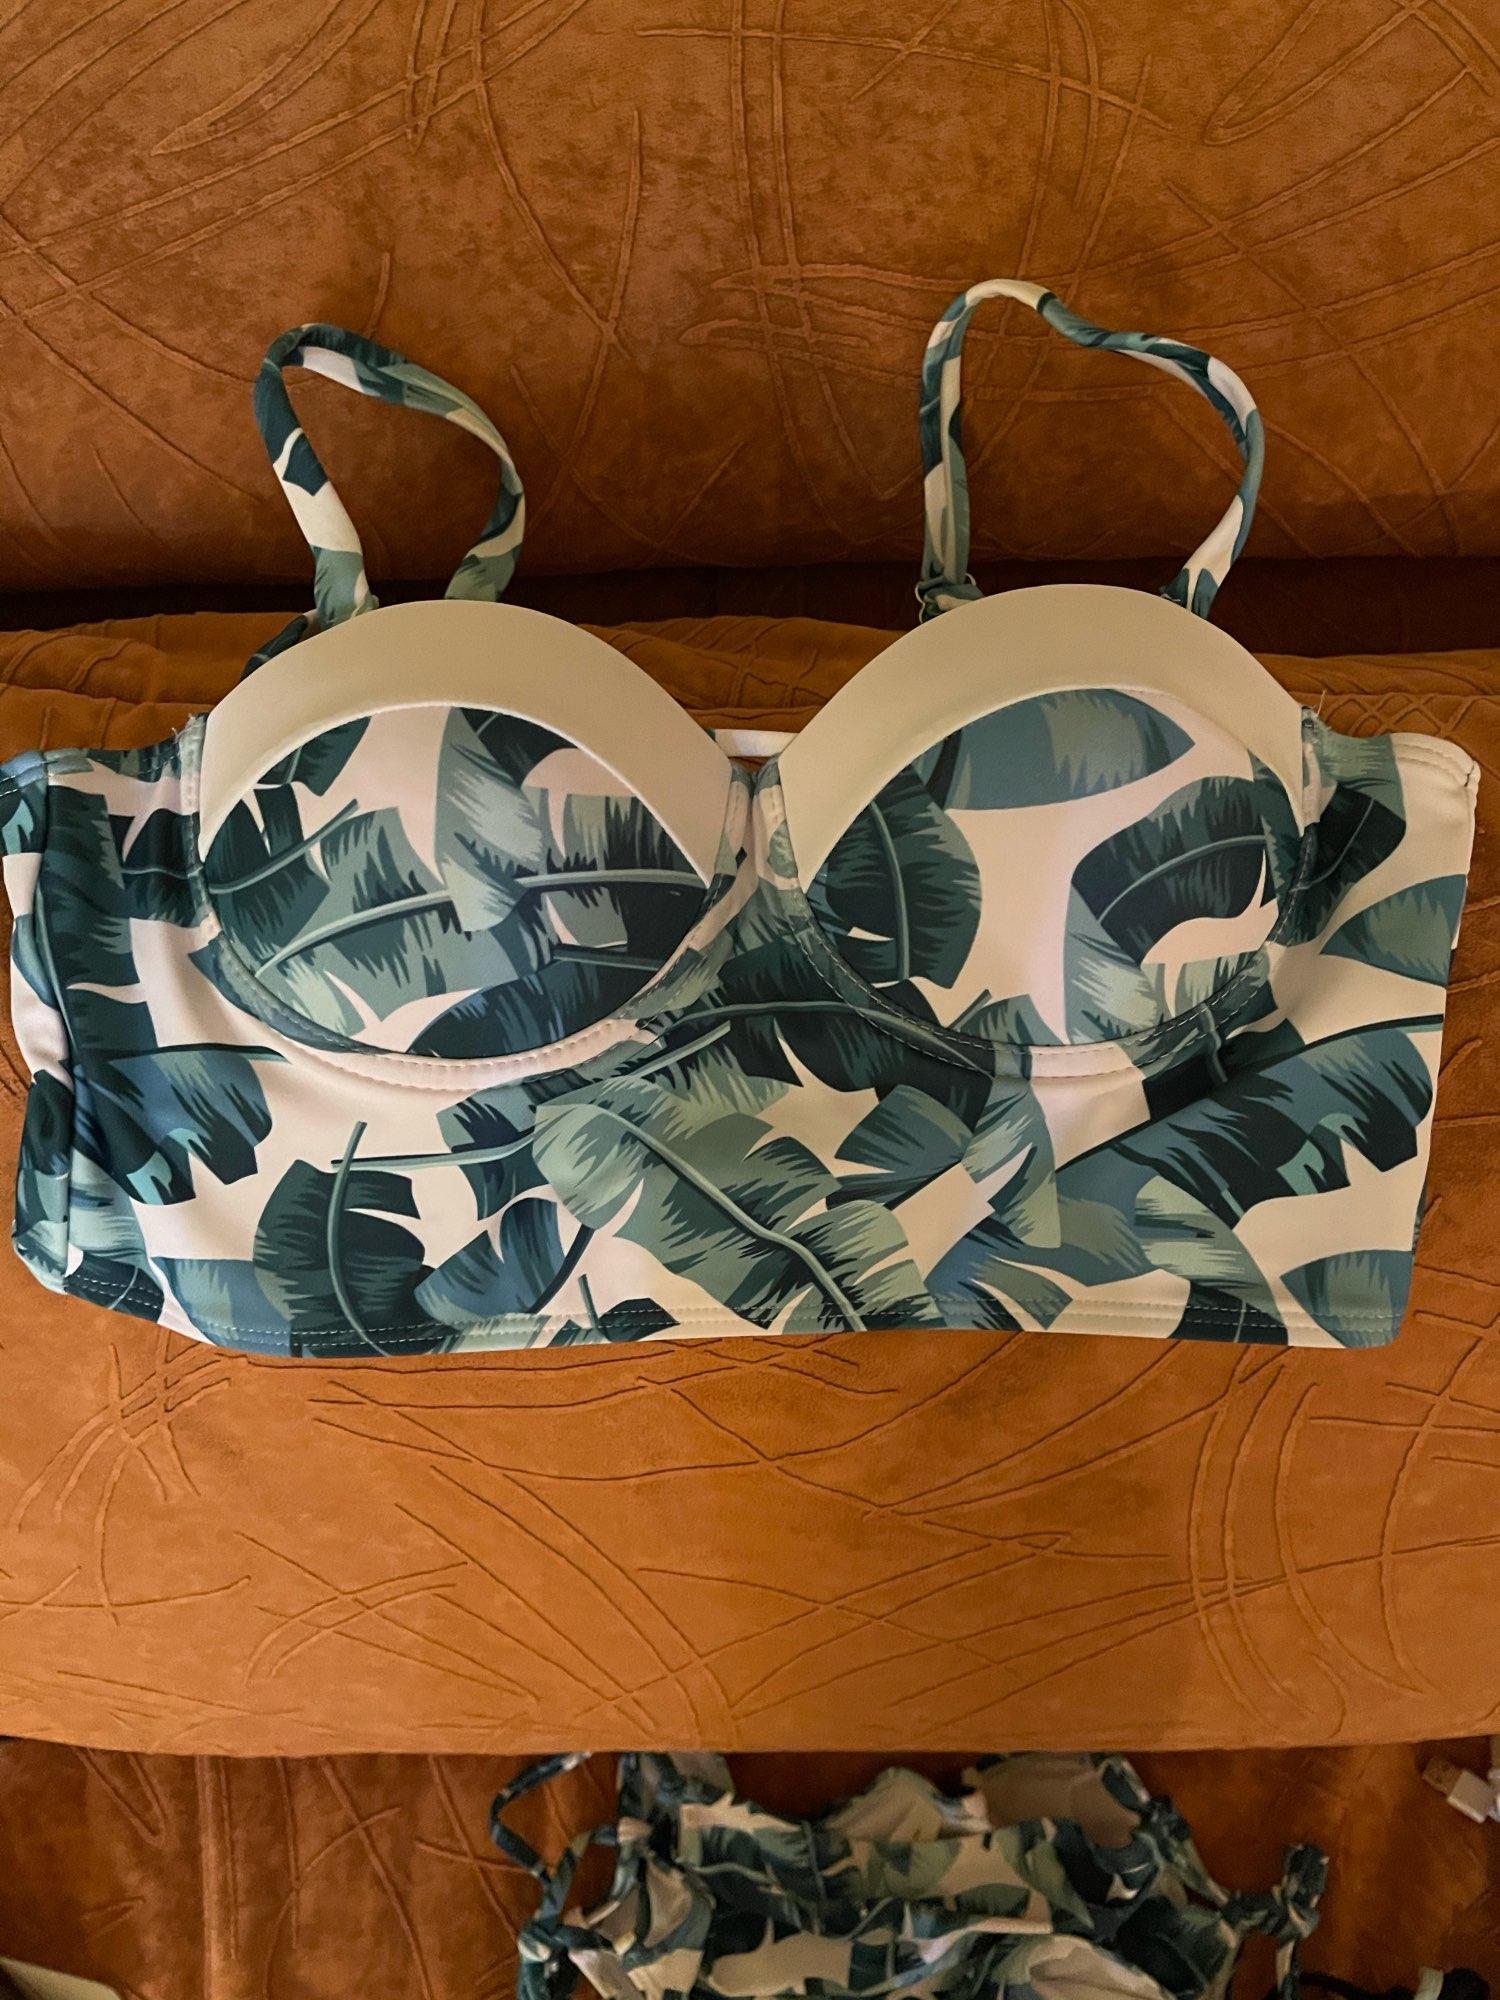 High Waist Swimwear 2021 New Leaf Print Bikinis Women Swimsuit Vintage Retro Bathing Suit Halter Biquini Maillot de bain femme Bikini Set    - AliExpress